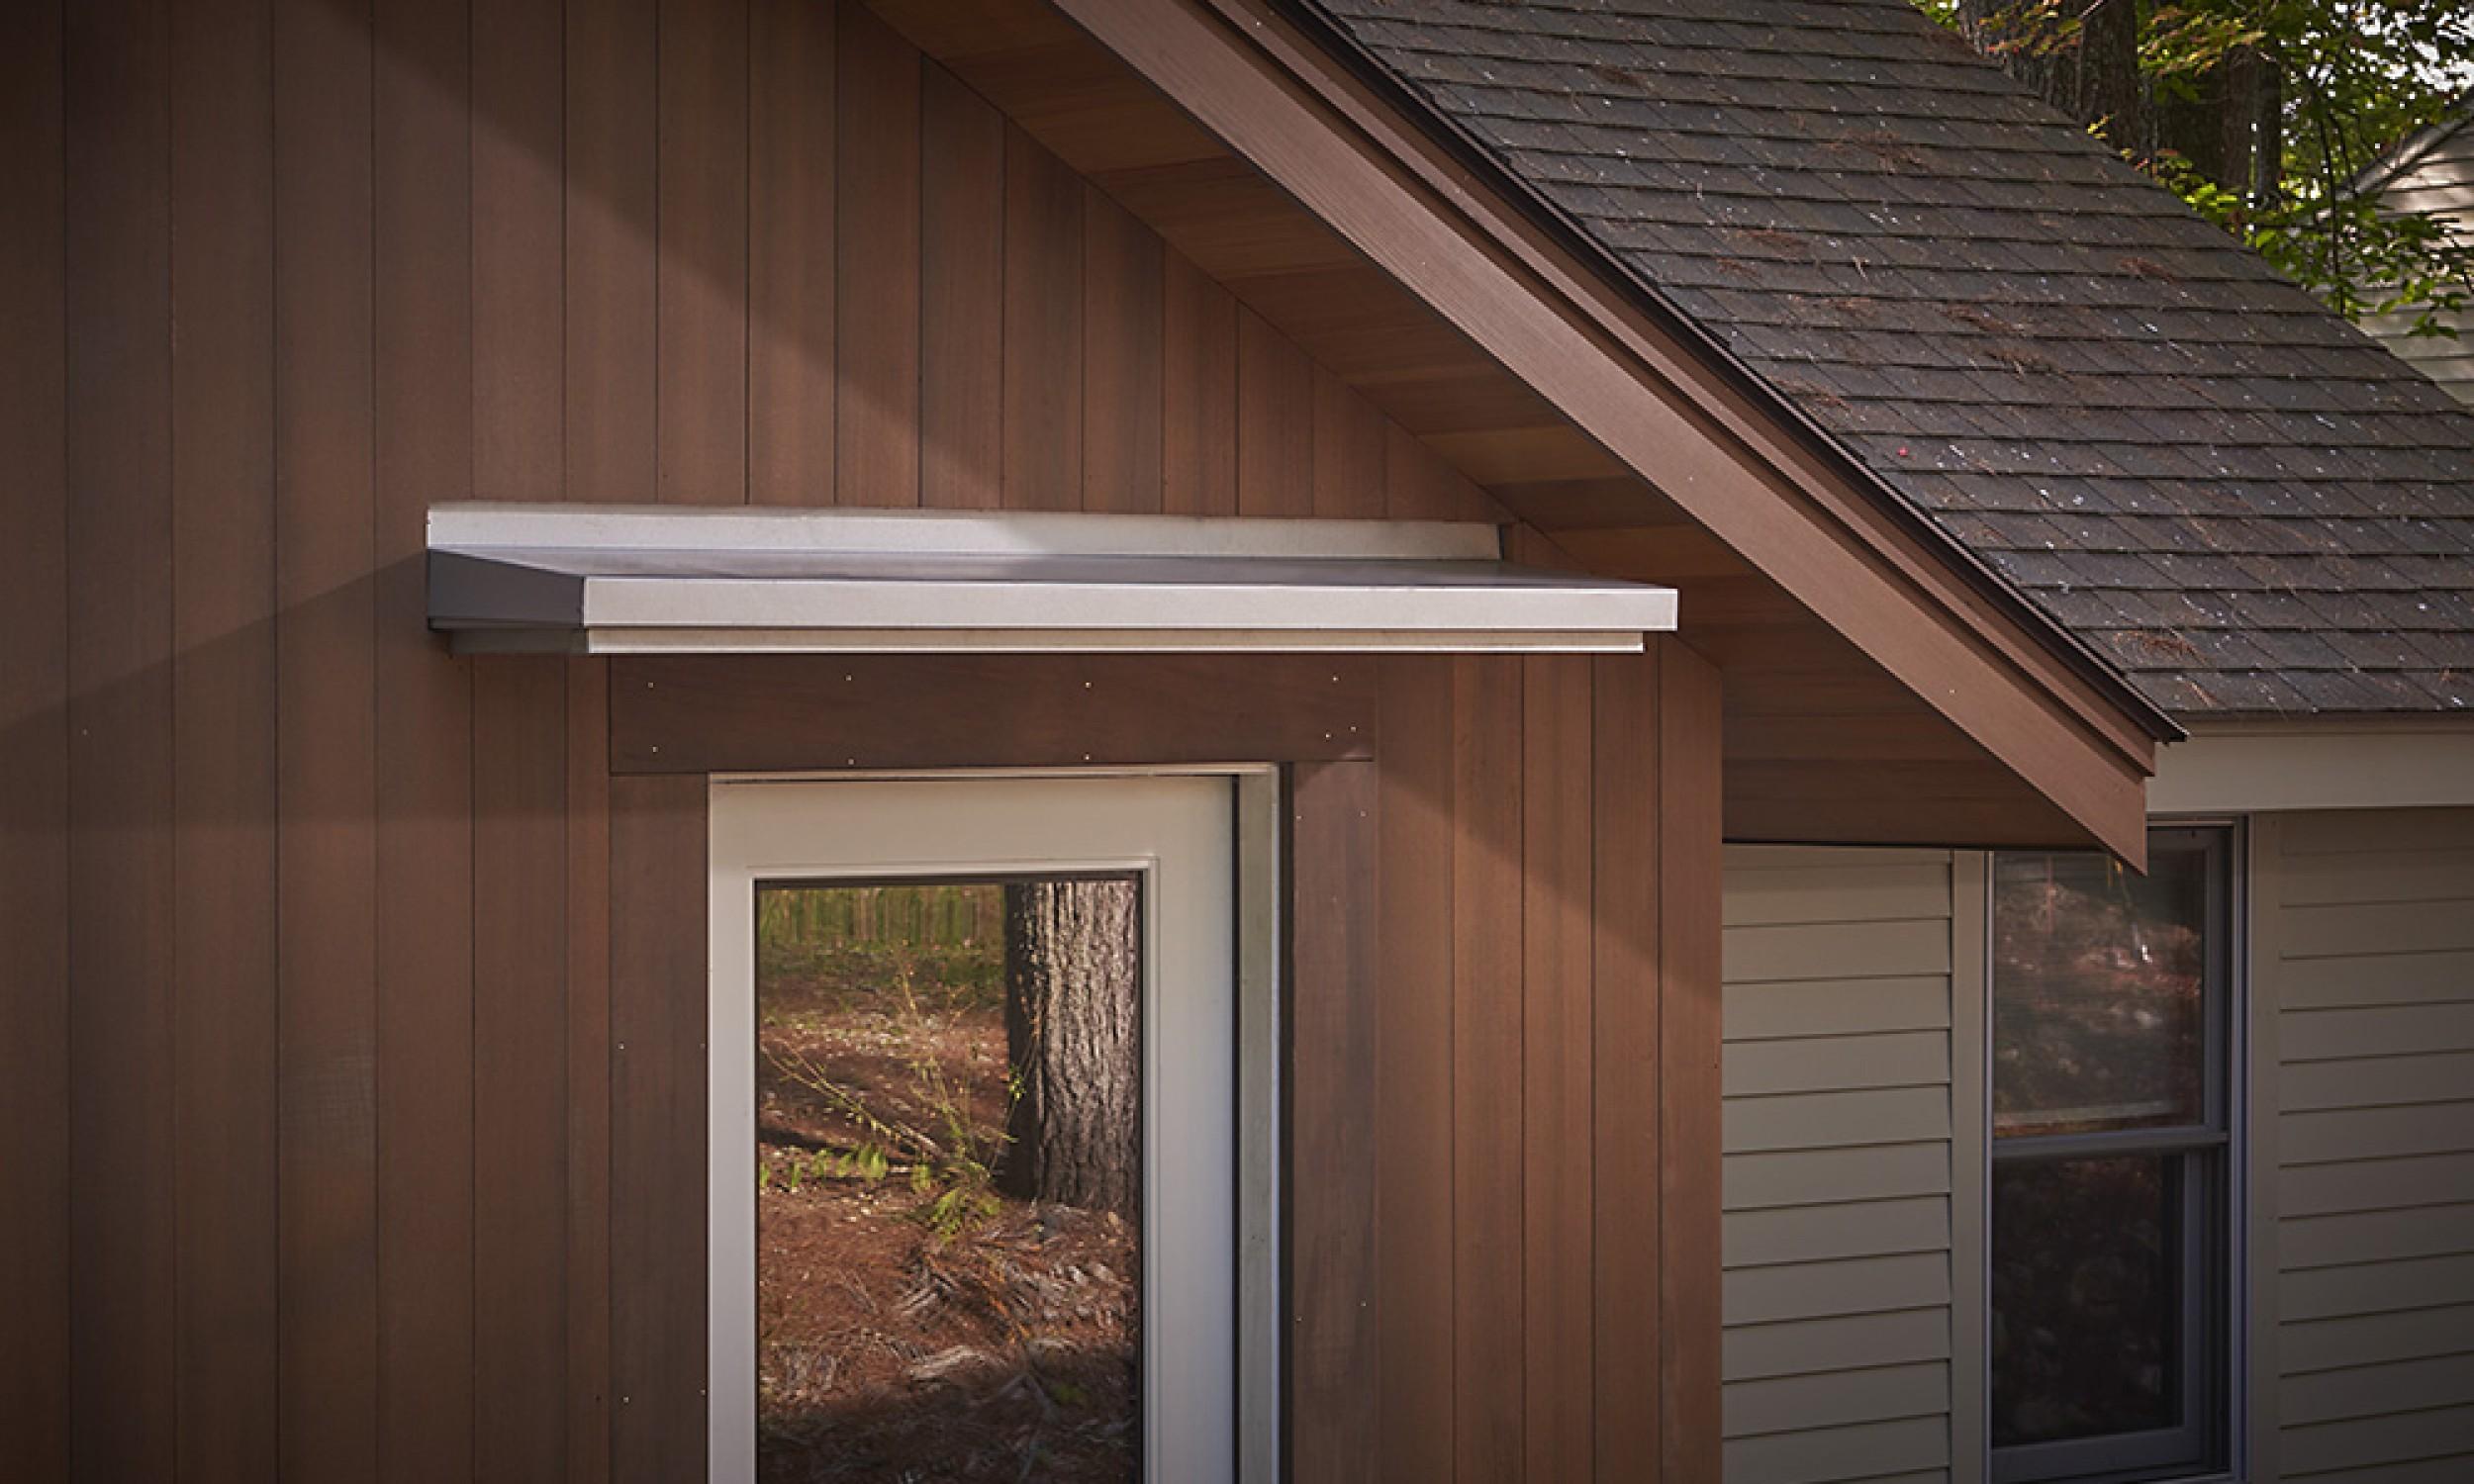 Canopy Roof, galvalume metal, Maine Architect, cedar siding,  Sherwin Williams stain